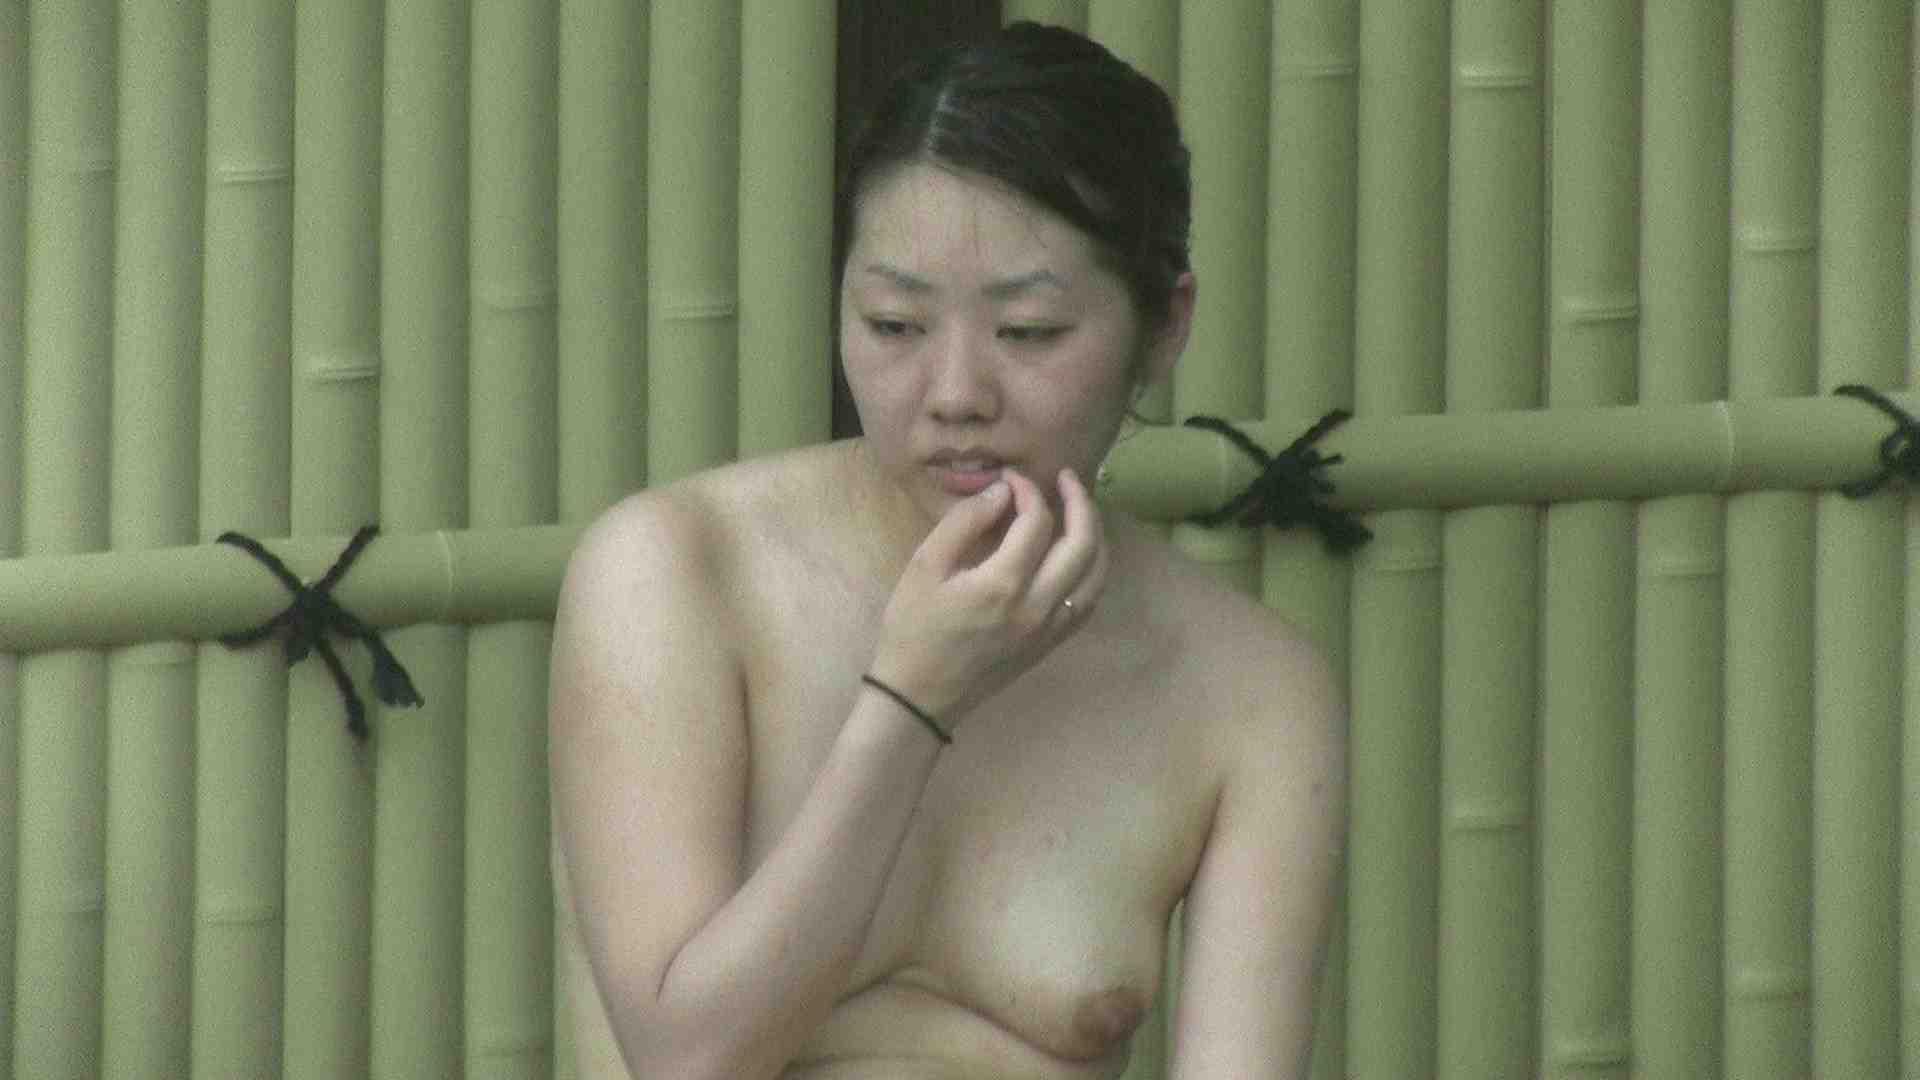 Aquaな露天風呂Vol.194 露天風呂編  110PIX 16